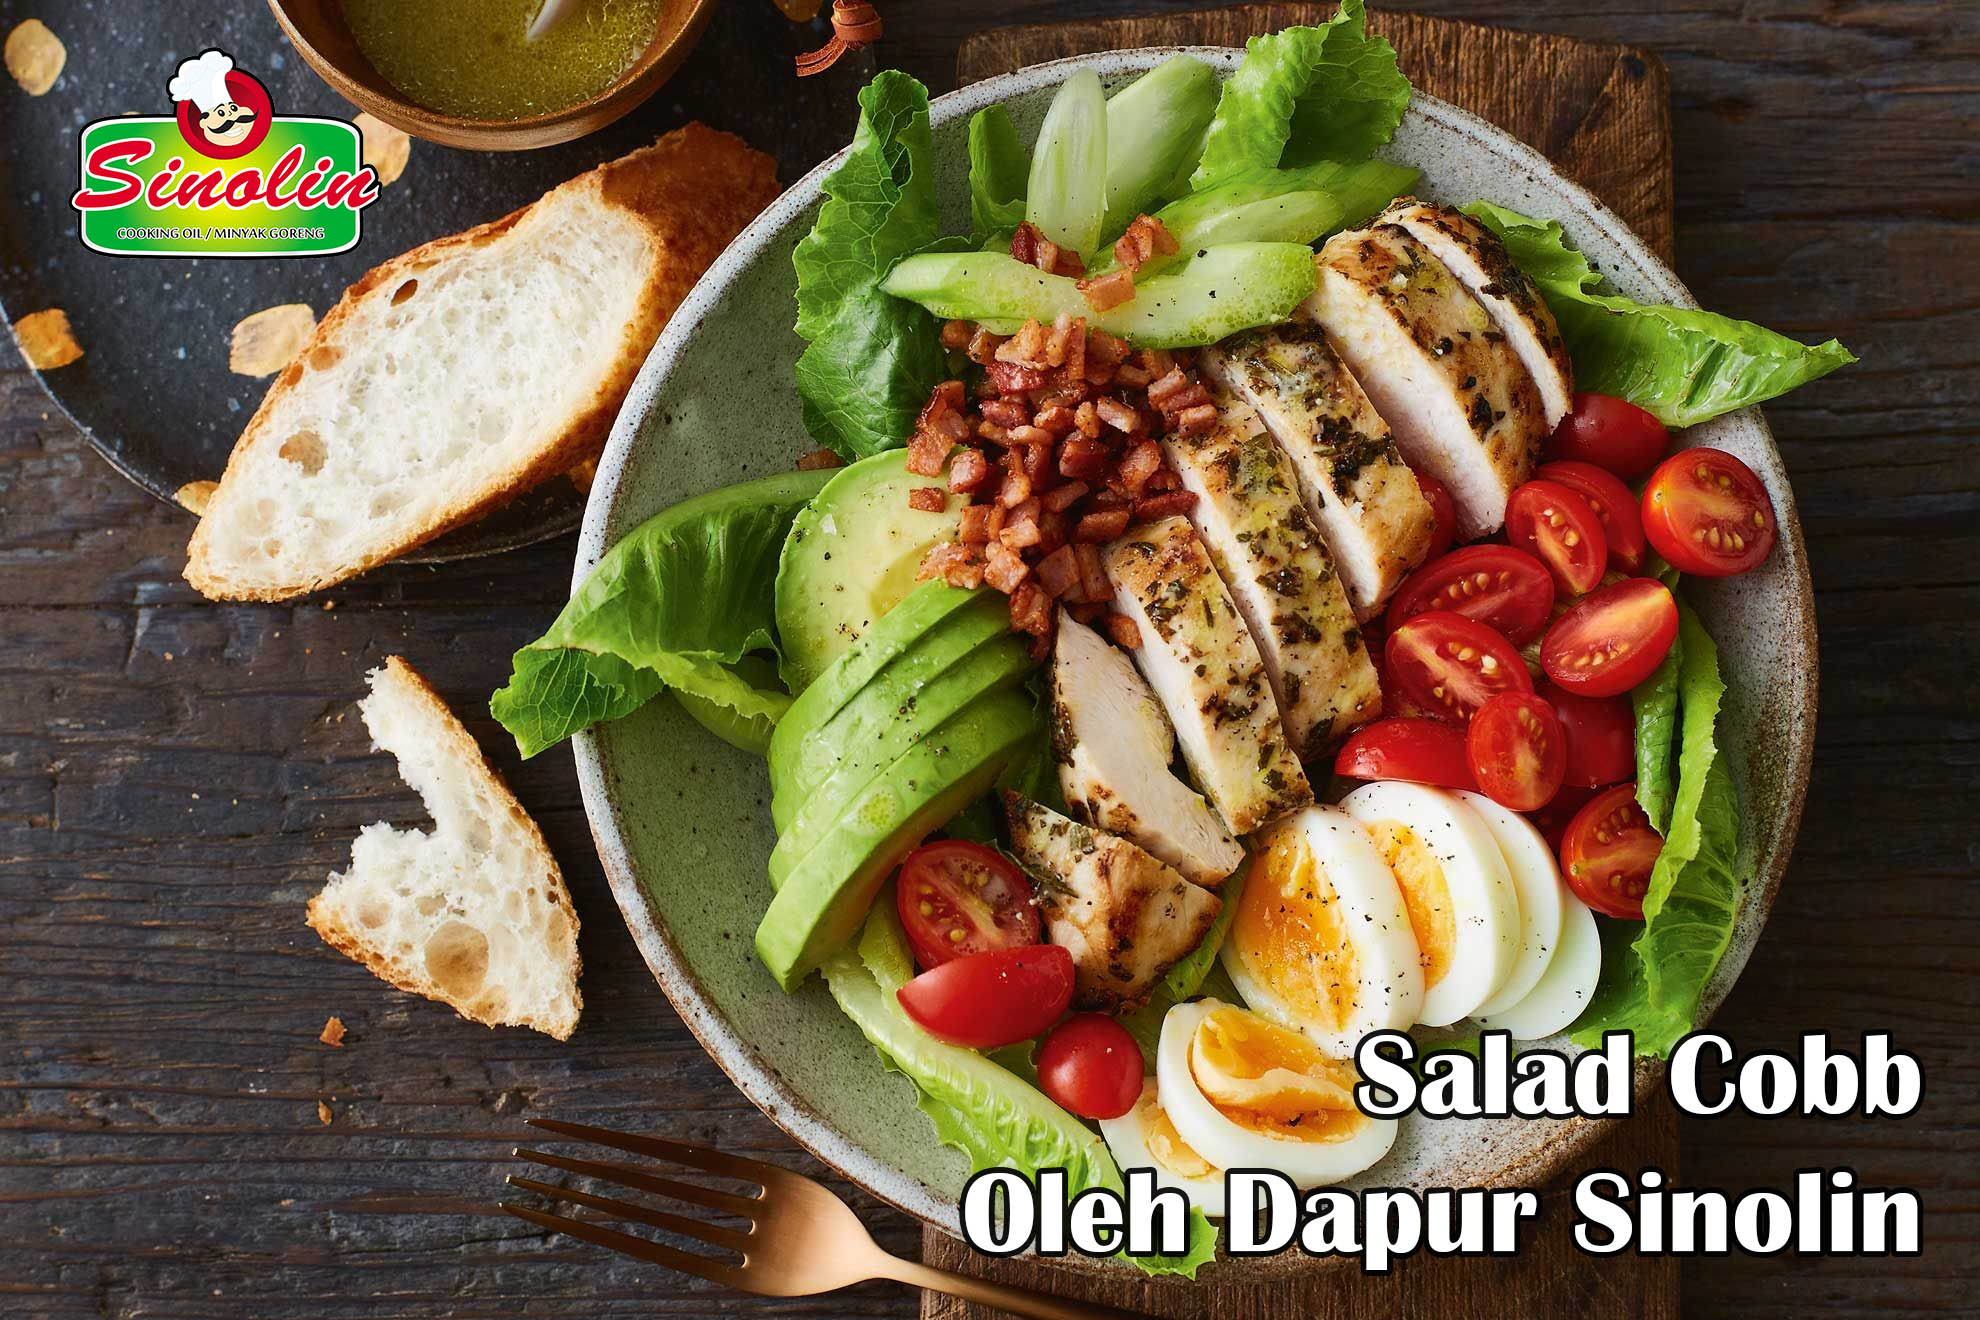 Salad Cobb oleh Dapur Sinolin